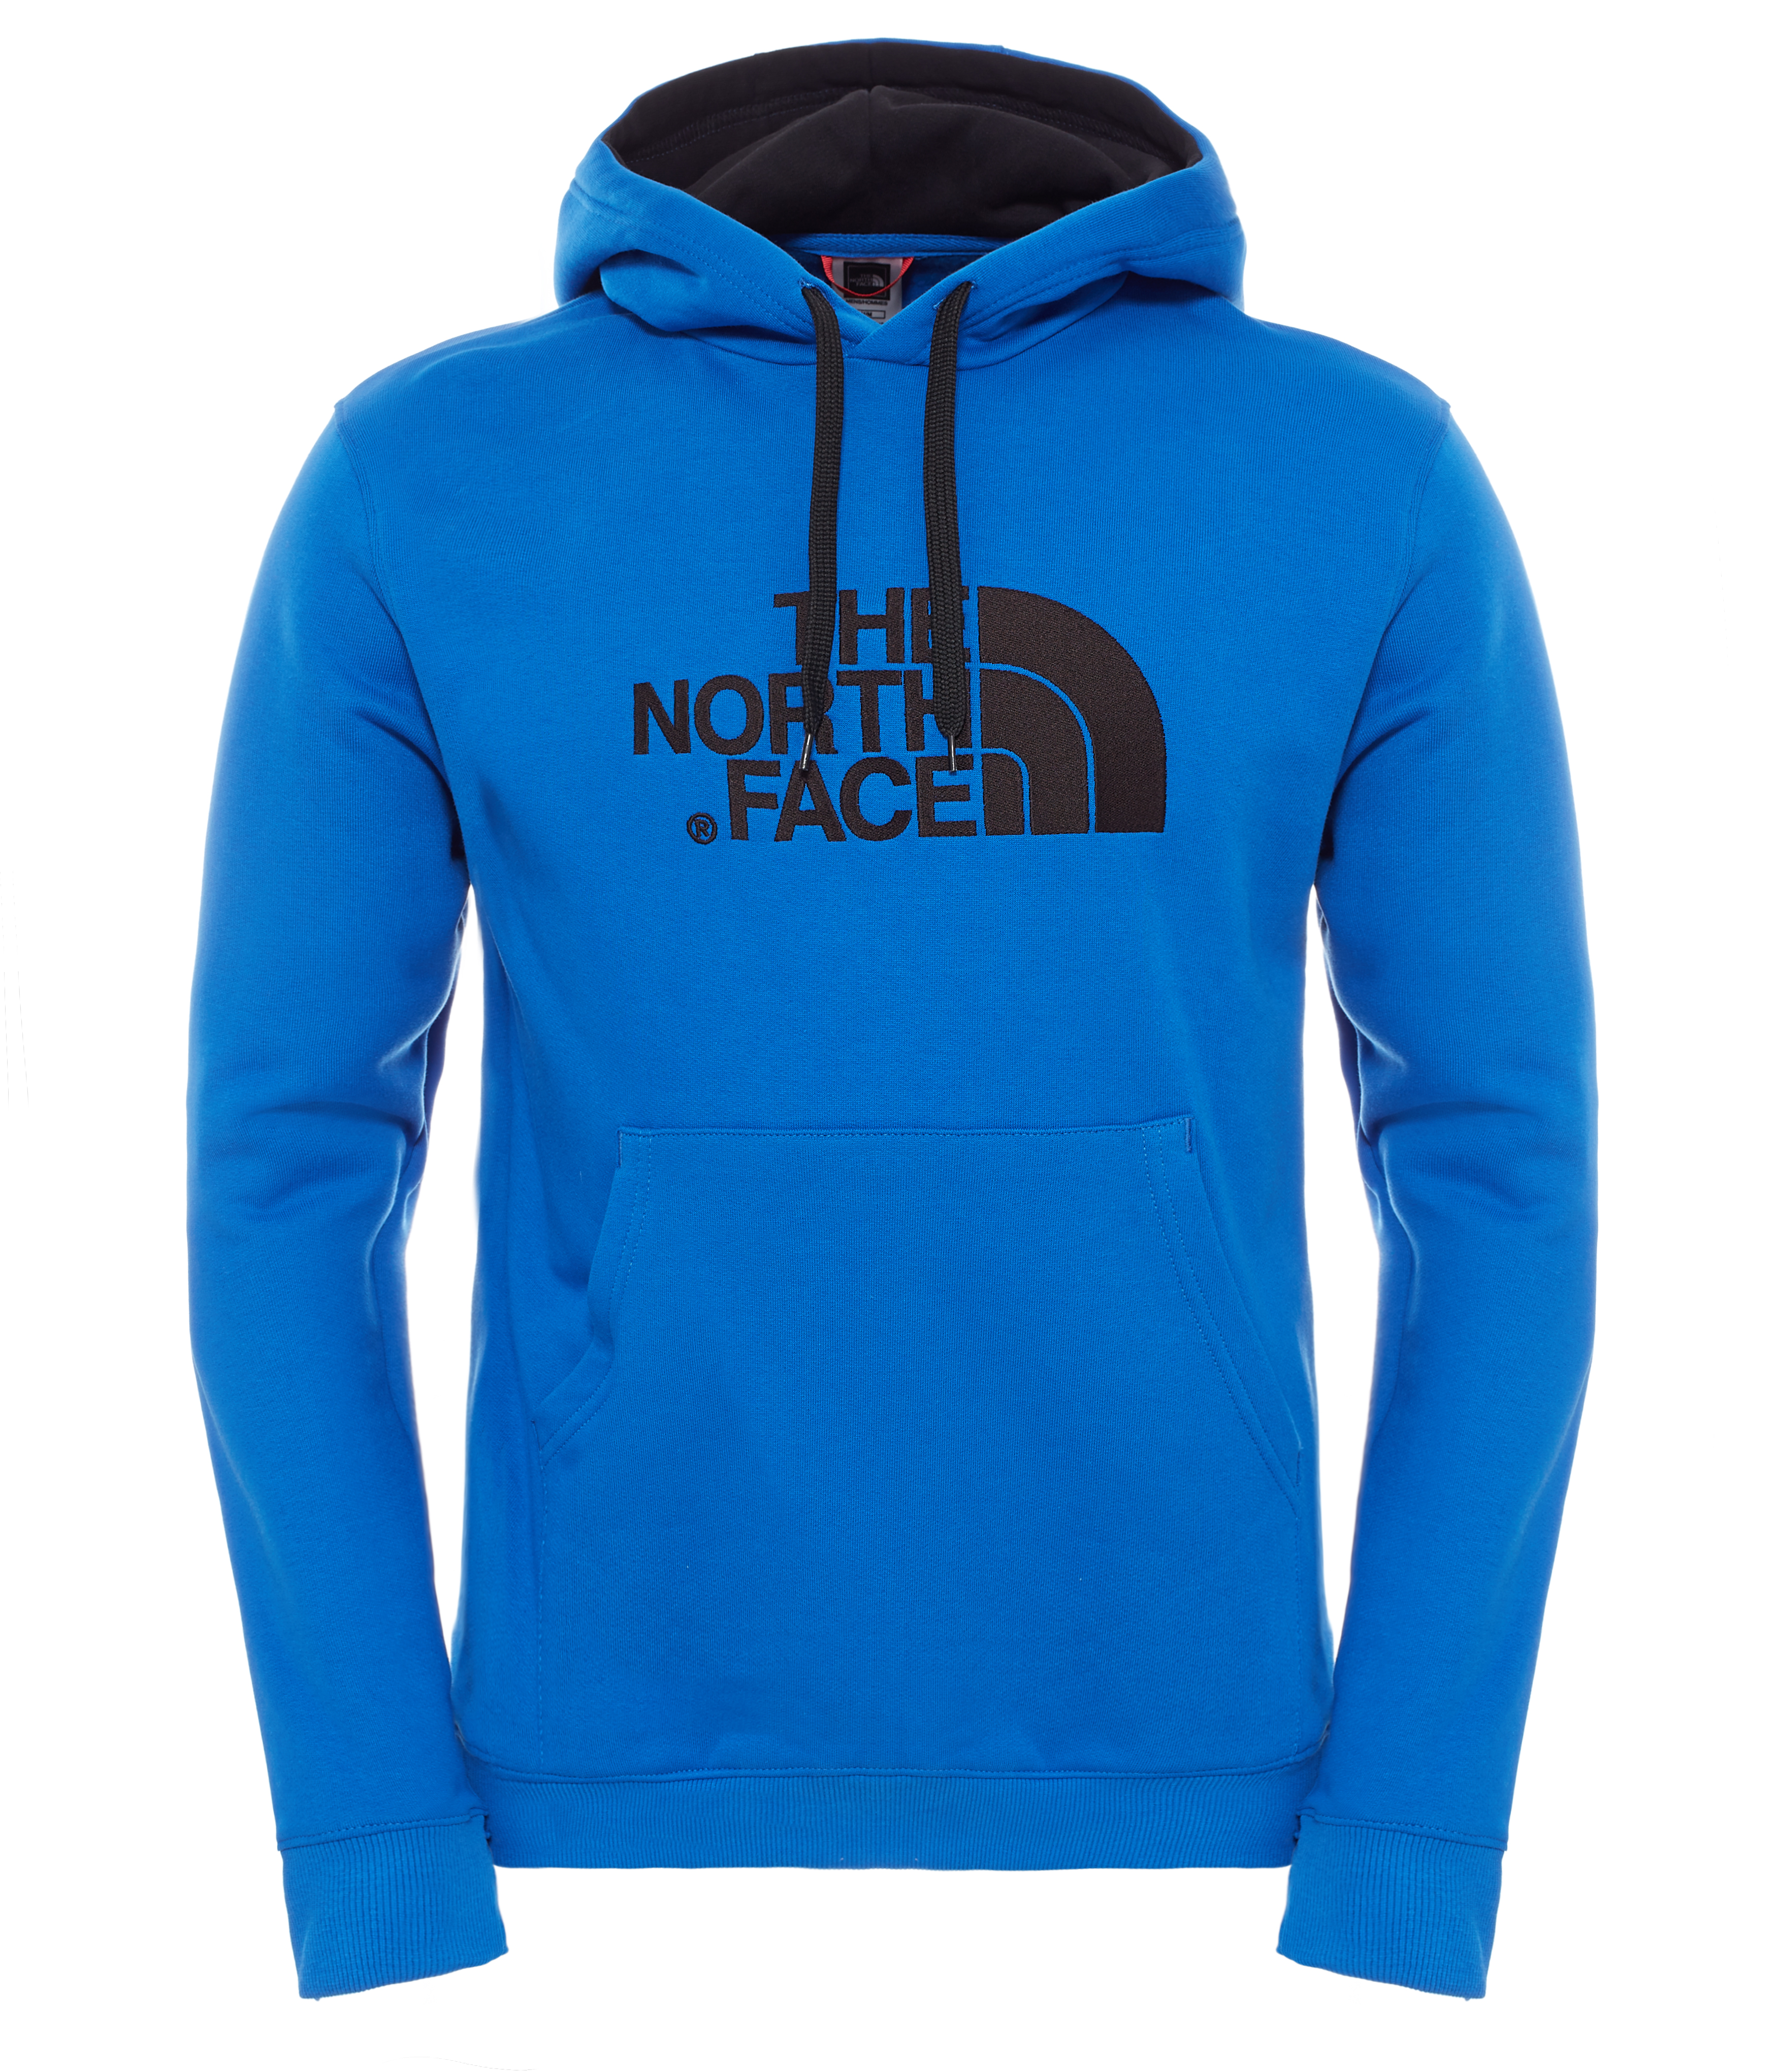 the north face drew peak pullover hoodie pulls sweats. Black Bedroom Furniture Sets. Home Design Ideas